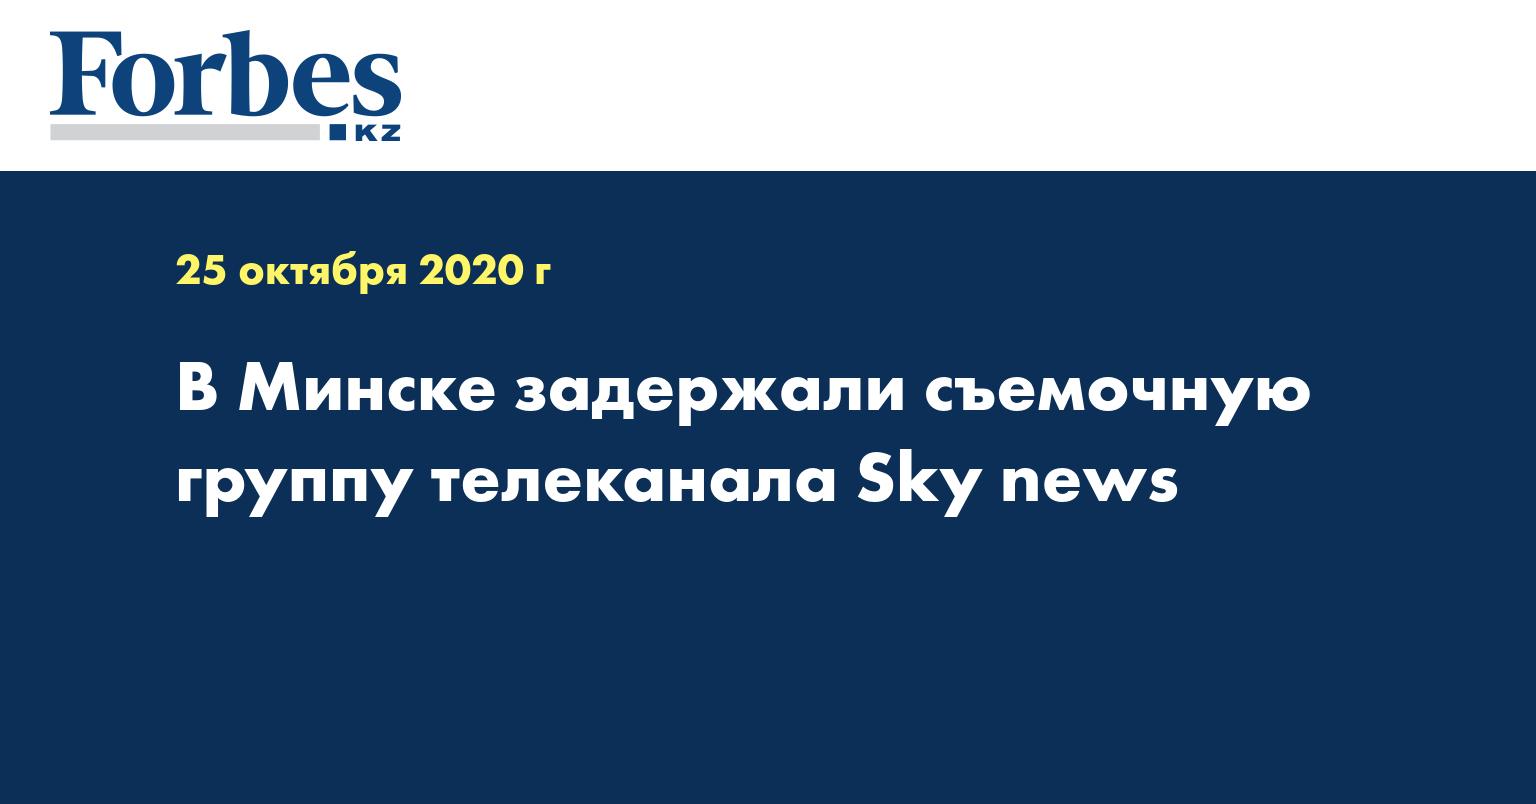 В Минске задержали съемочную группу телеканала Sky news